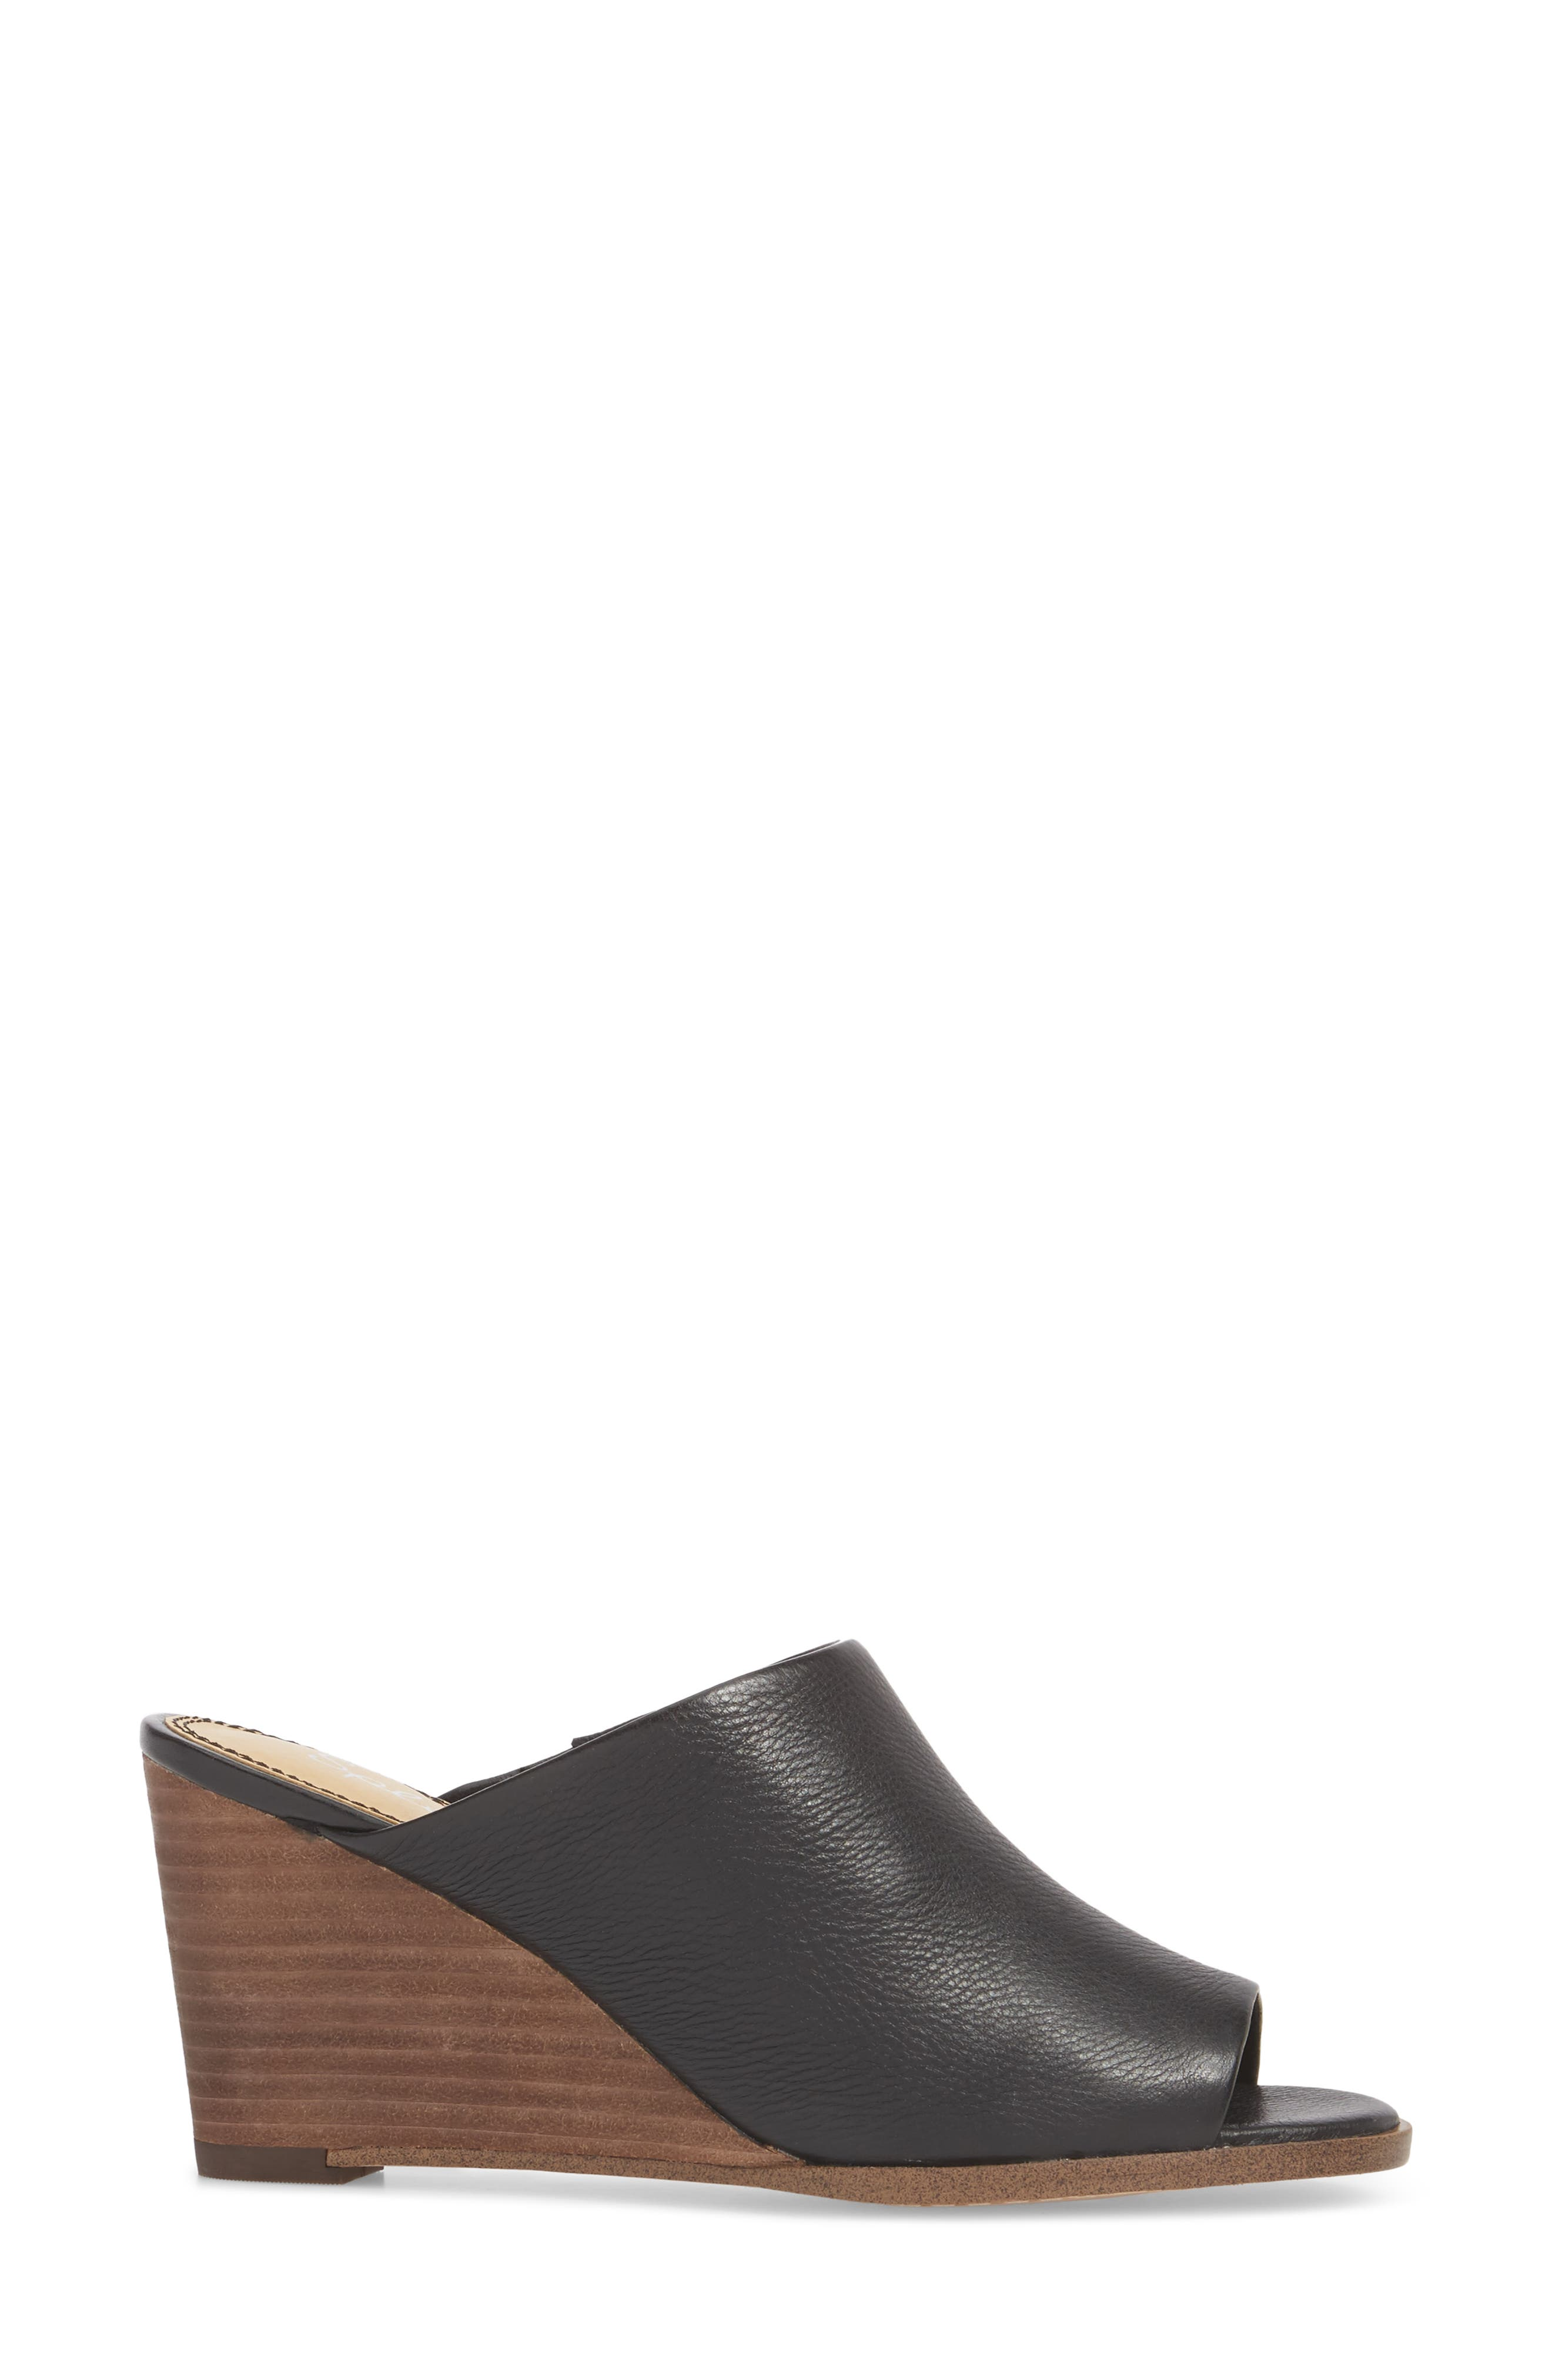 Fenwick Wedge Sandal,                             Alternate thumbnail 3, color,                             Black Leather